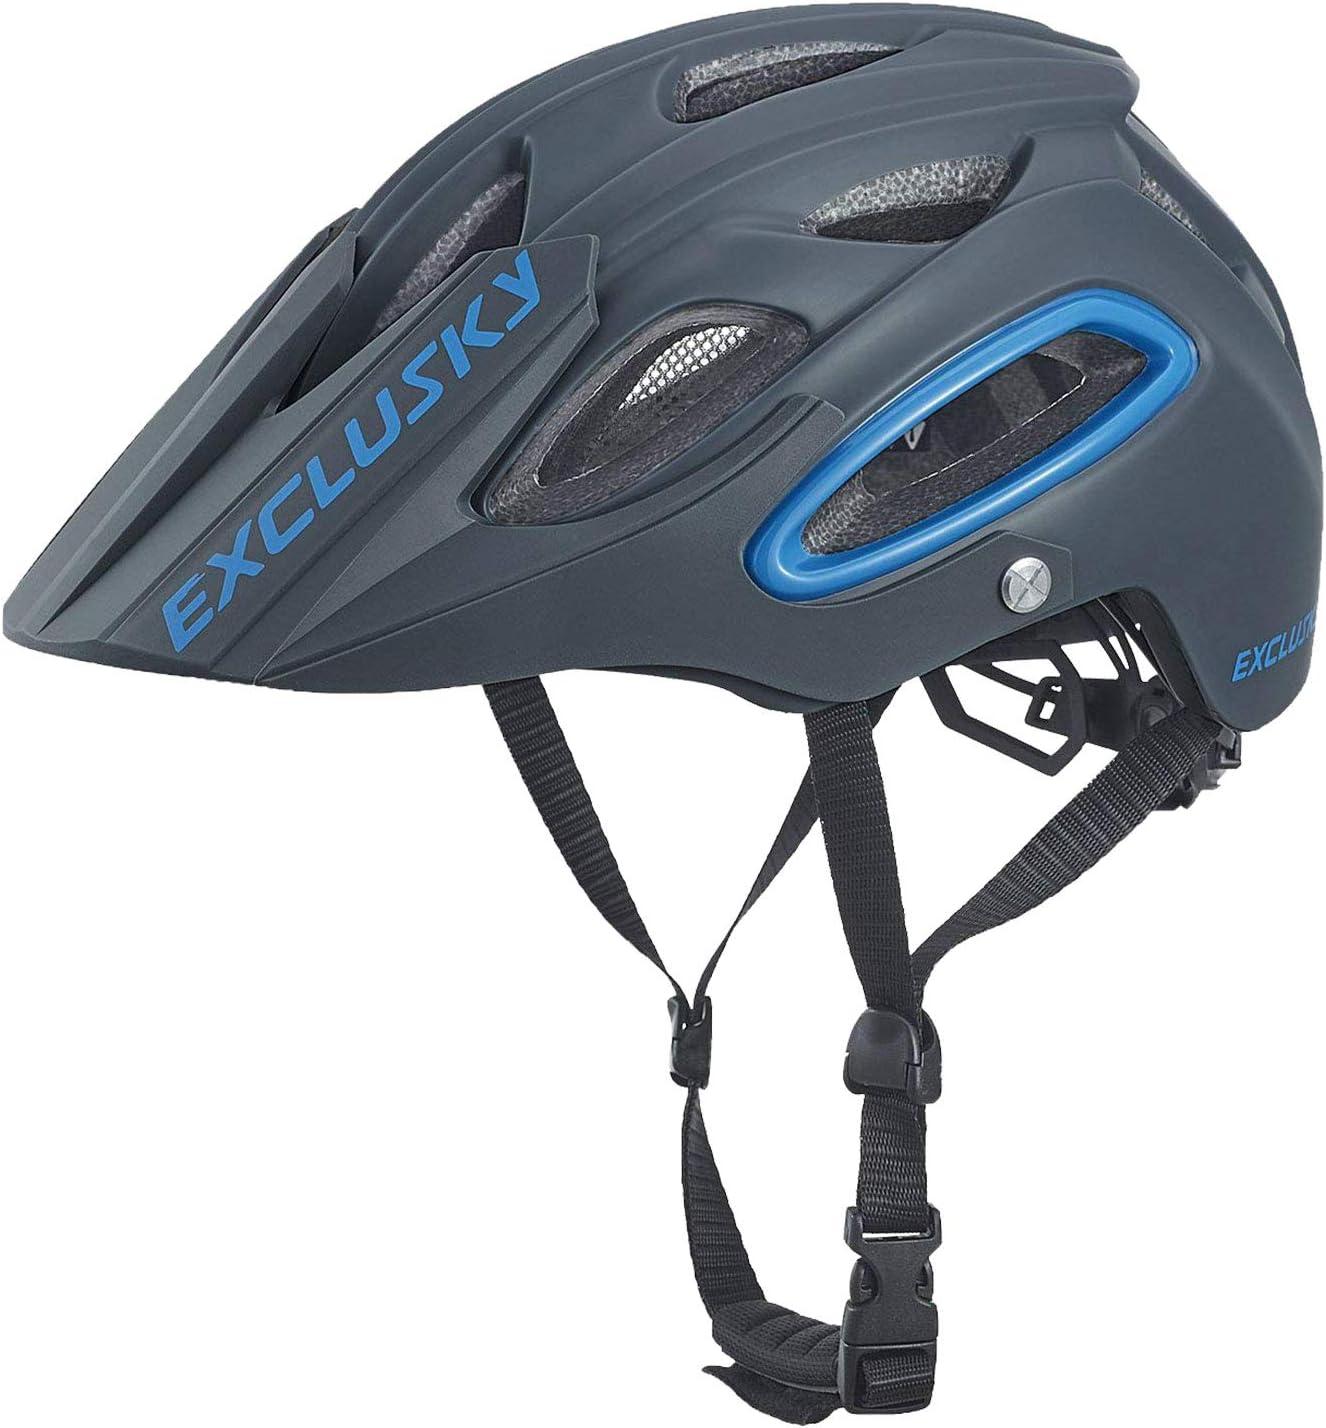 54-58cm Exclusky Casco de Ciclismo,Unisex Adulto,M